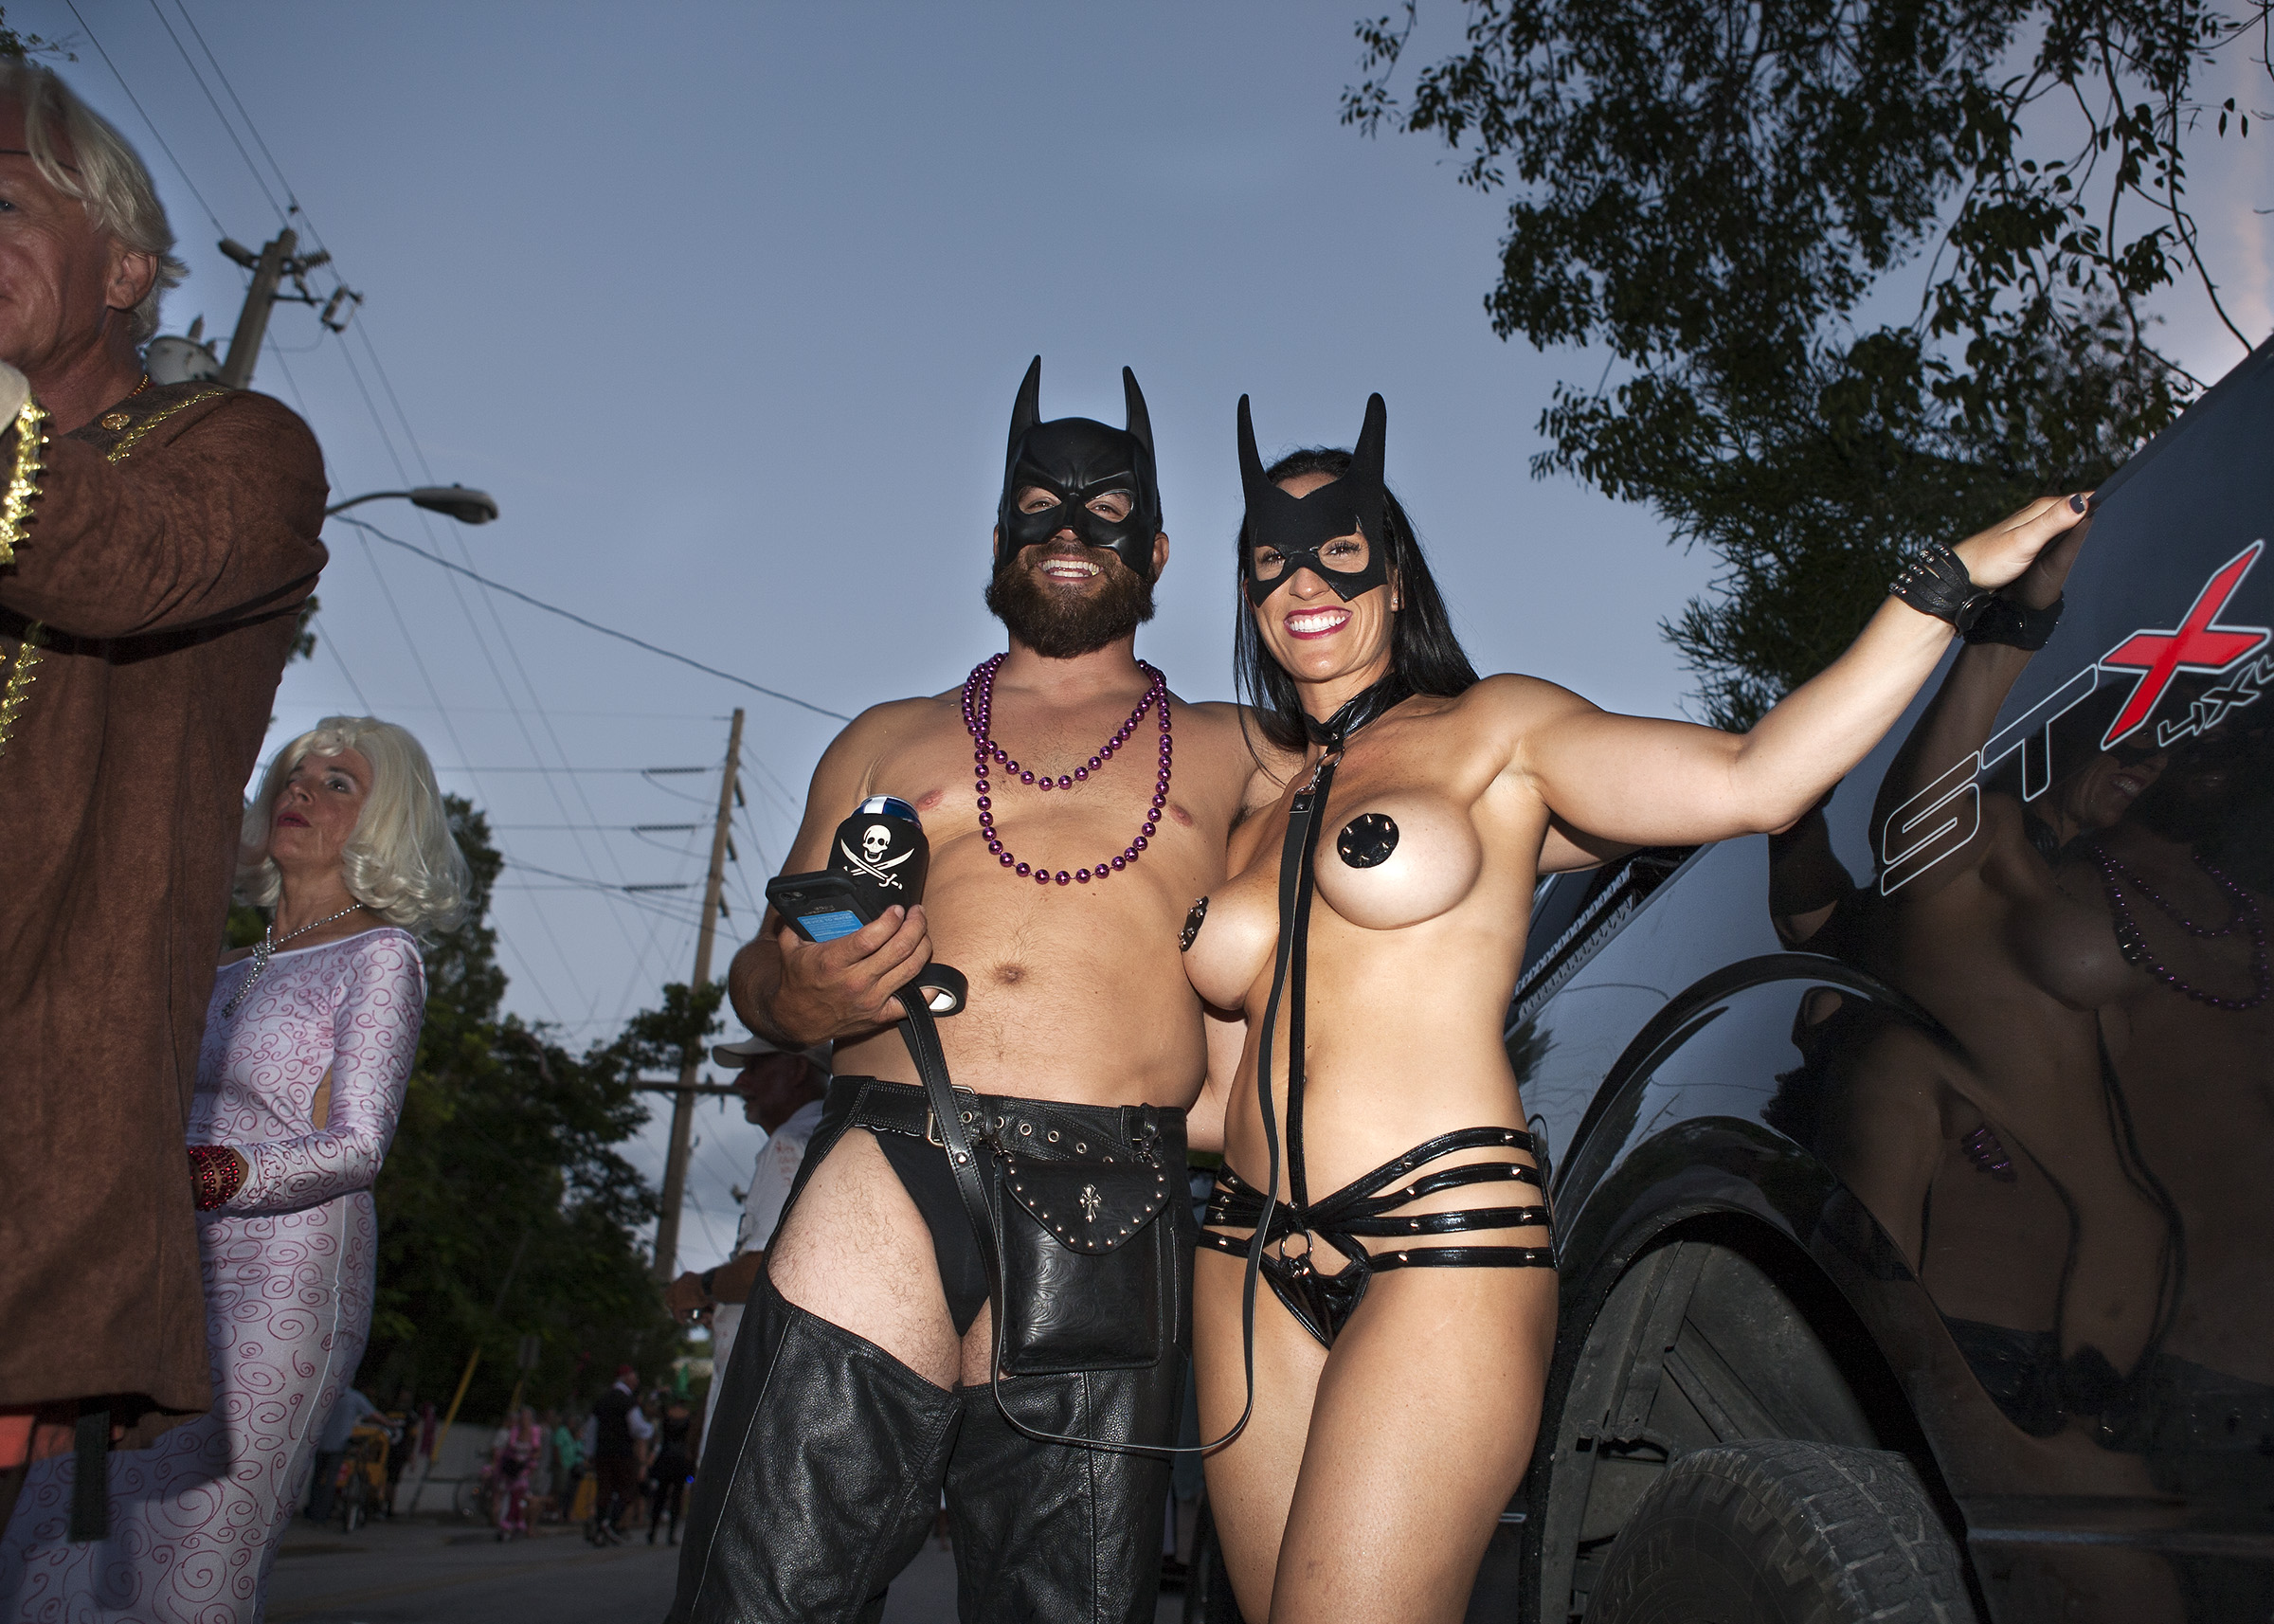 Key West Fantasy Fest 2015 by Andrew Printer